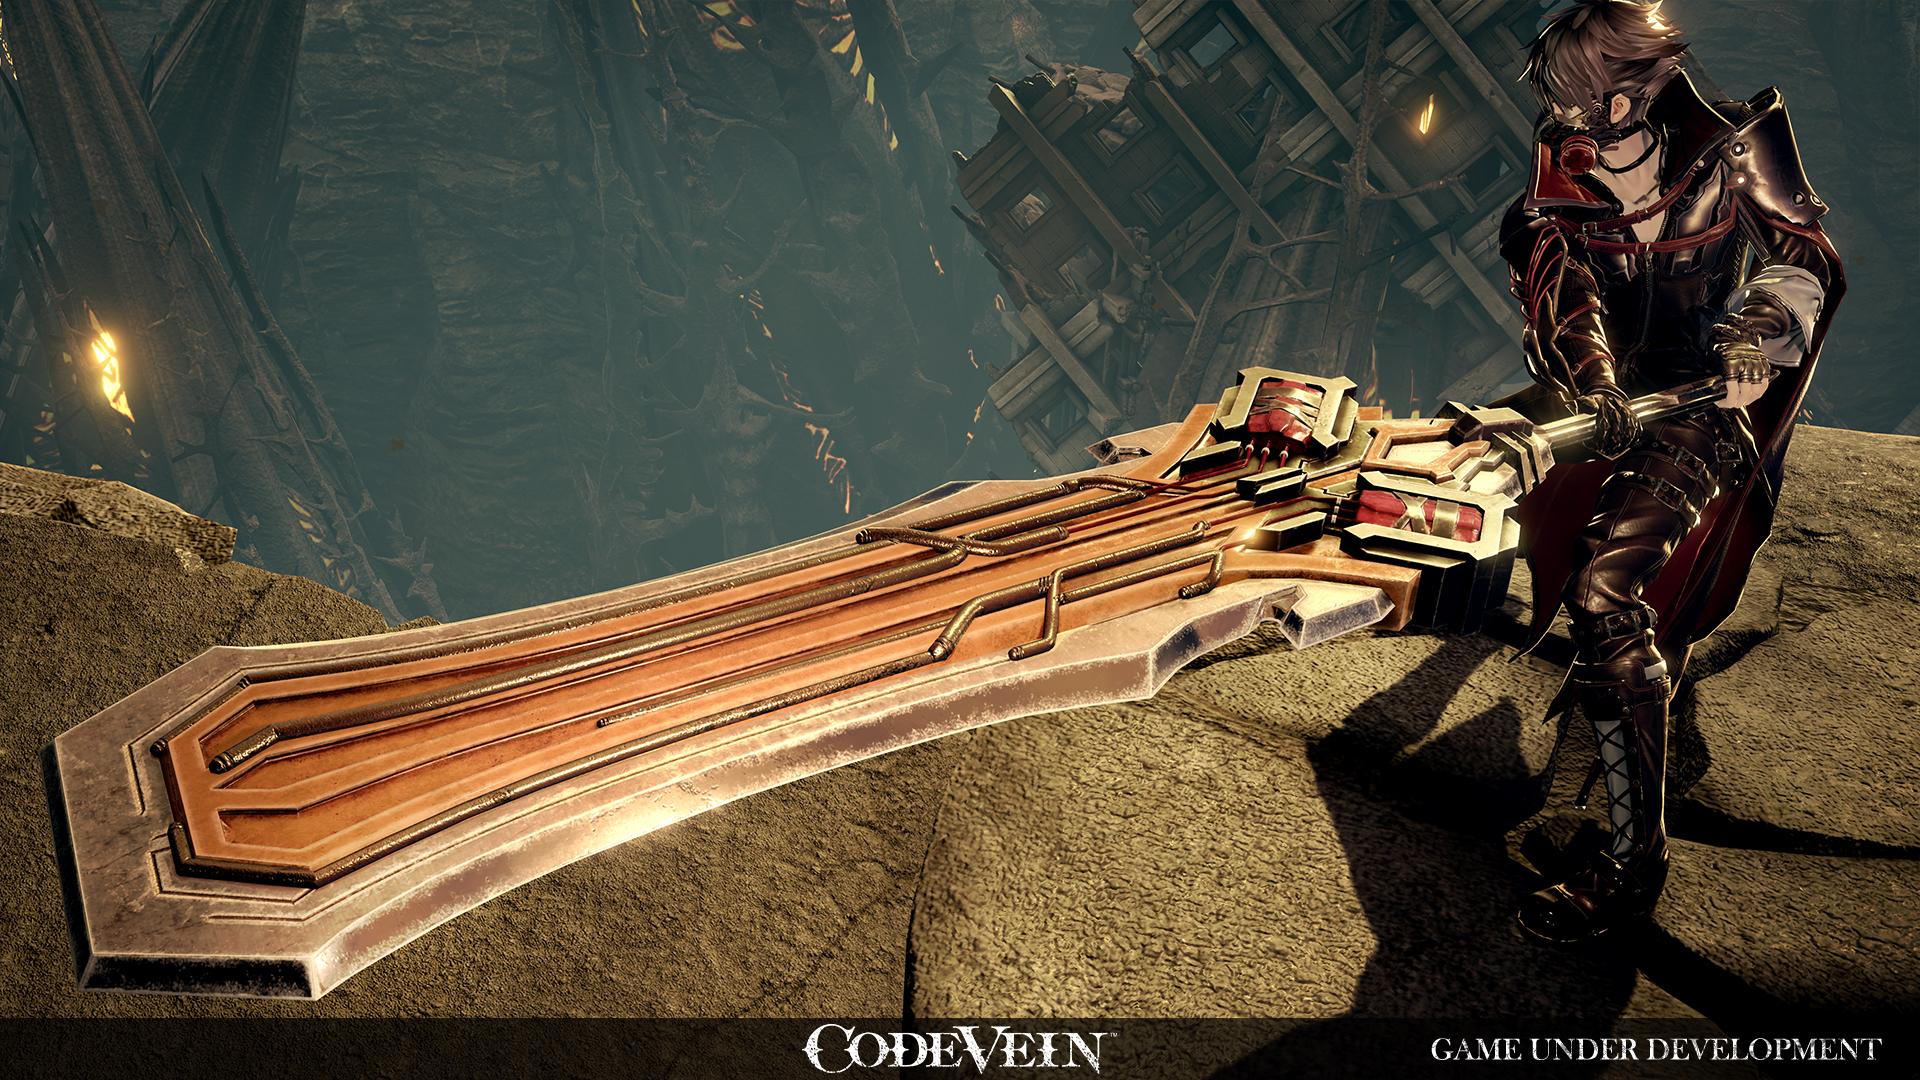 Code Vein Screenshot 02